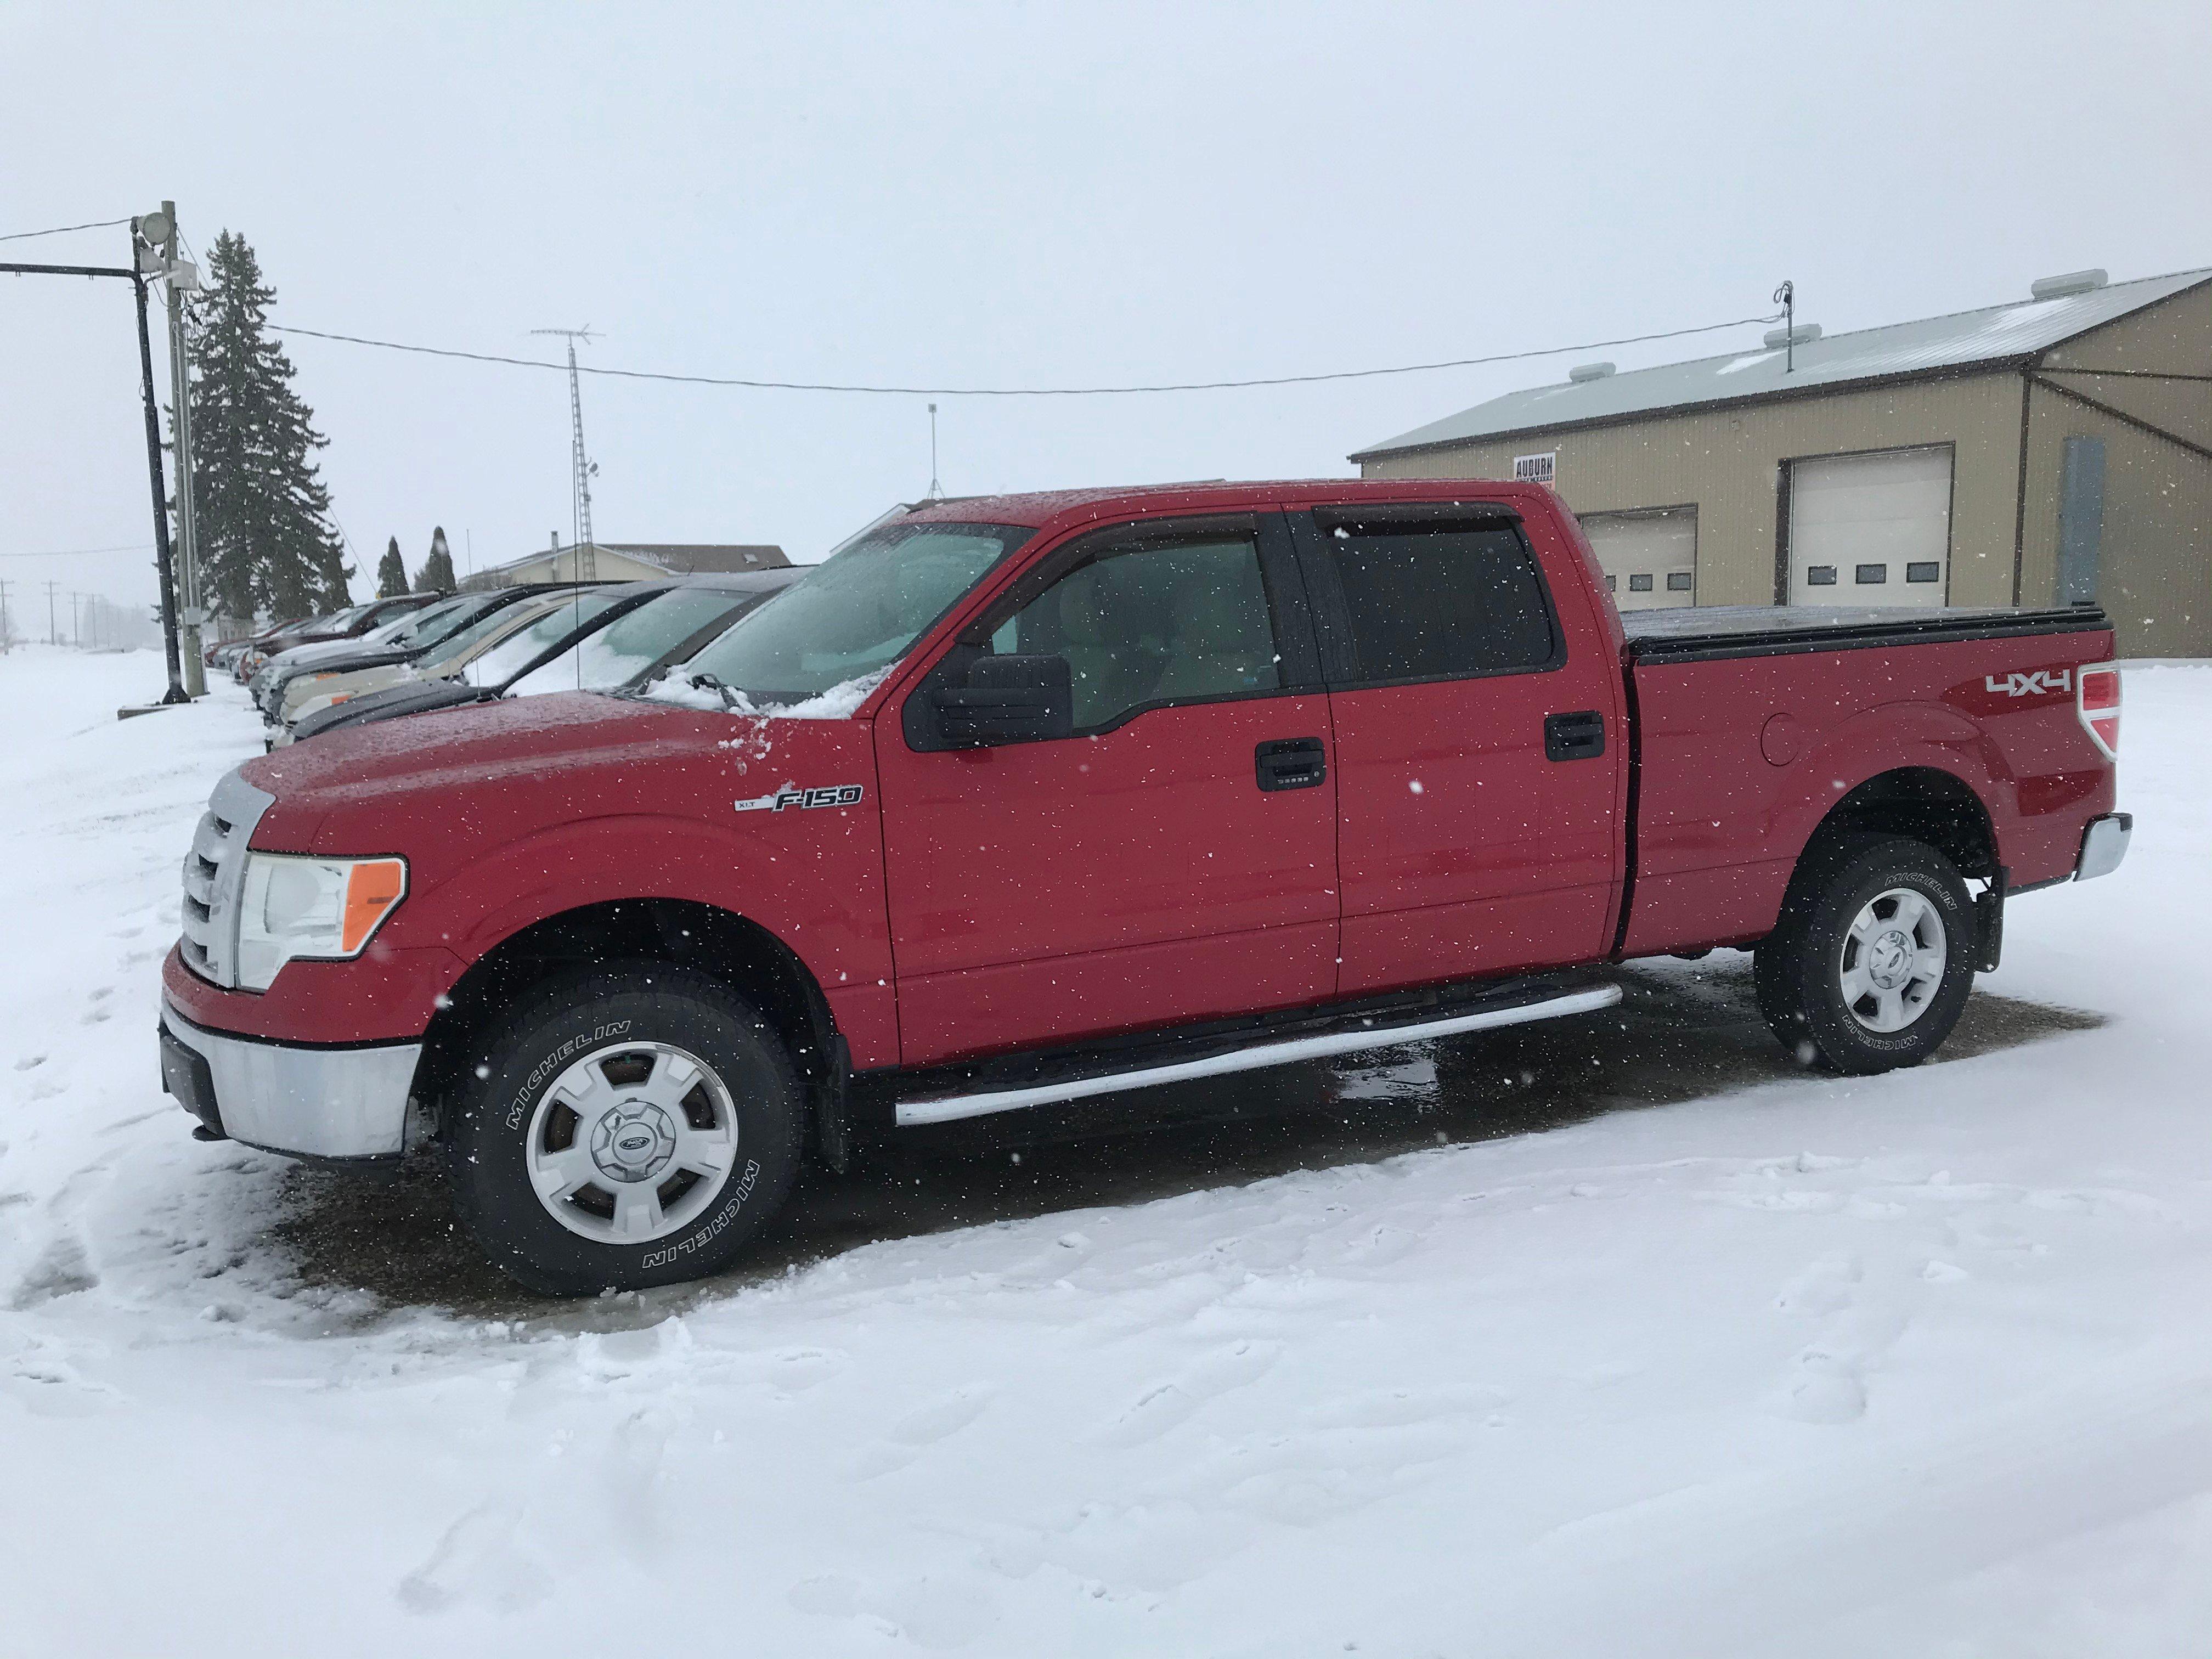 2010 Ford F150 5.4 litre, loaded, 4 door super crew, 4 x 4 308 825 km $9 995.00 + HST Certified